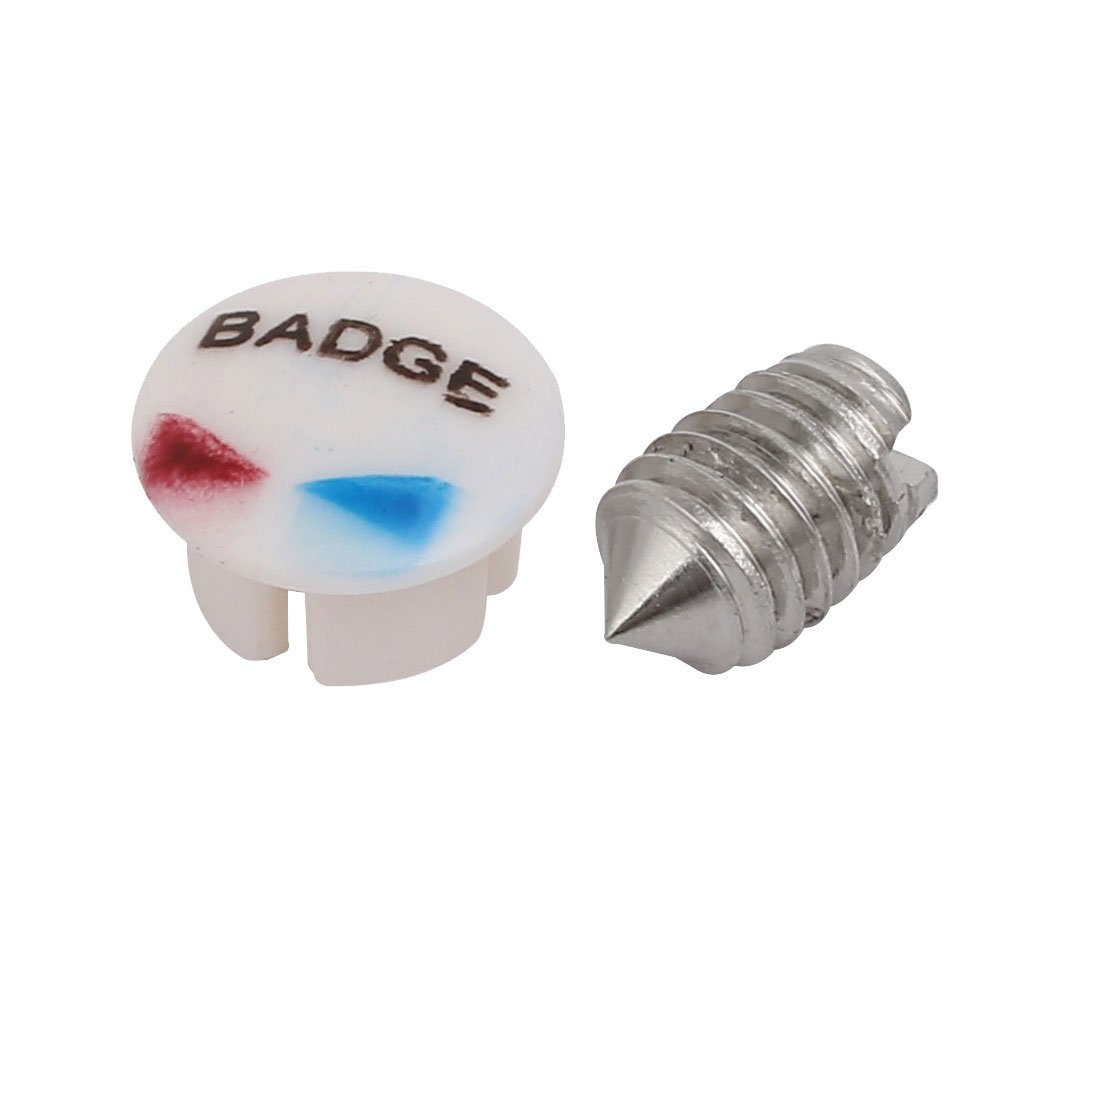 sourcingmap/® 120mmx50mmx35mm Faucet Zinc Alloy Chrome Plated Single Lever Handle Knob w Screw